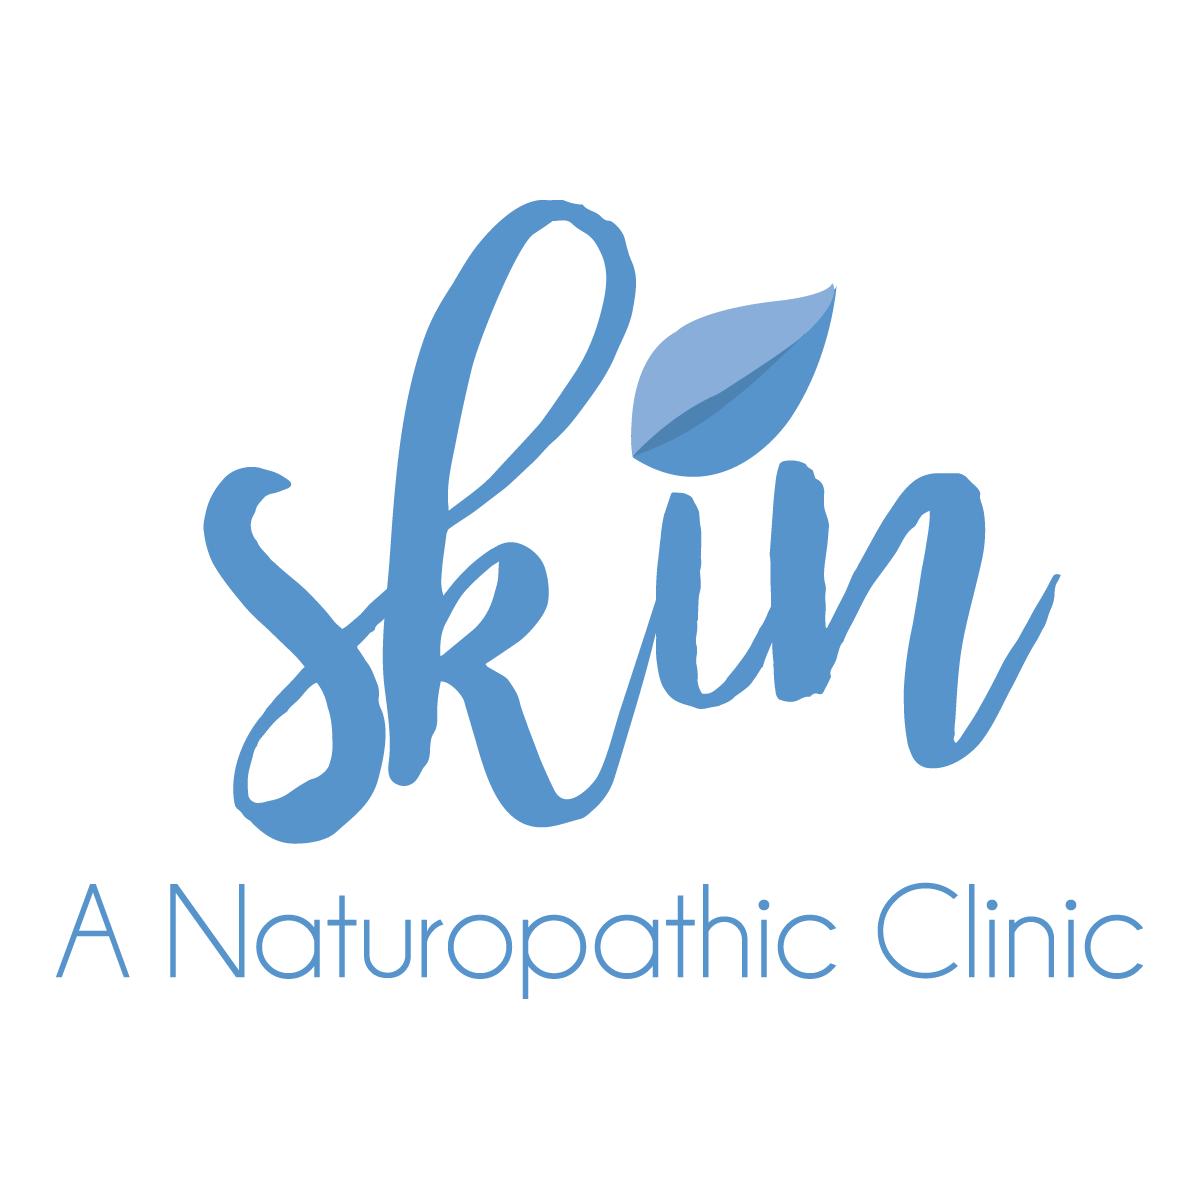 Natural Medicine | Skin, A Naturopathic Clinic | Encinitas CA